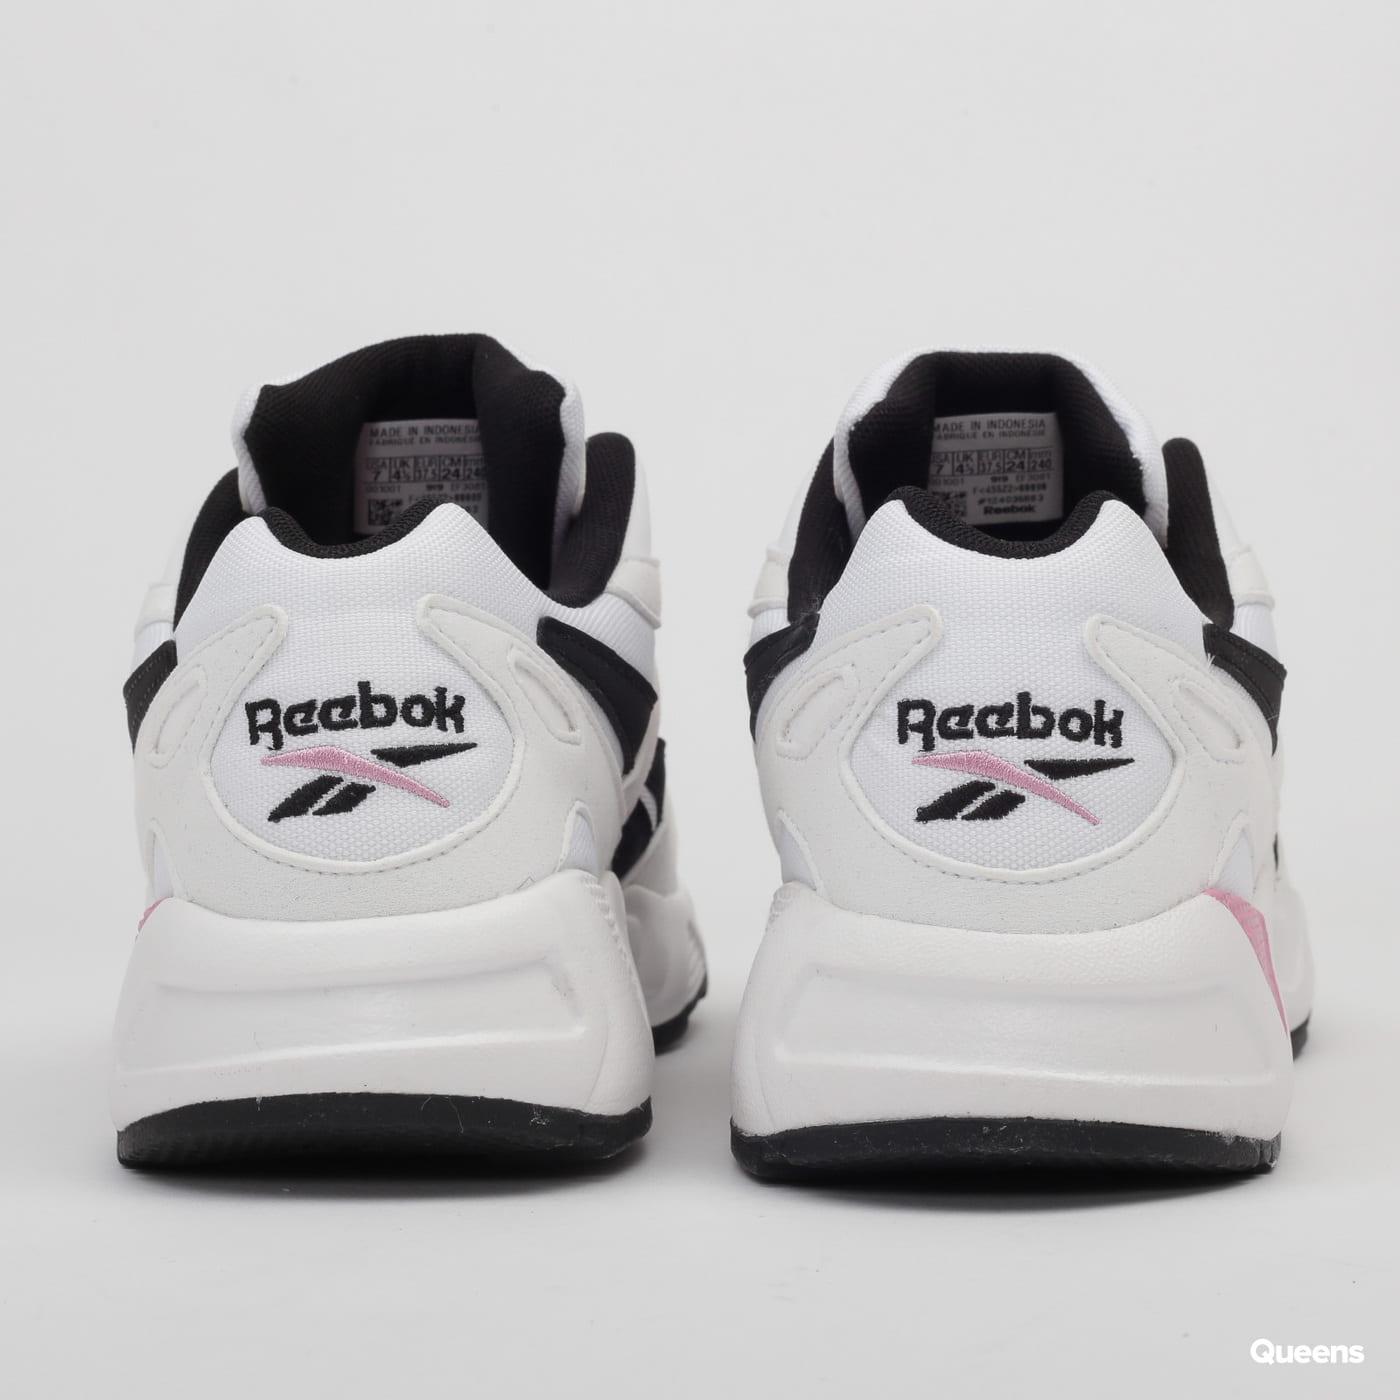 Reebok Aztrek 96 white / jaspnk / black